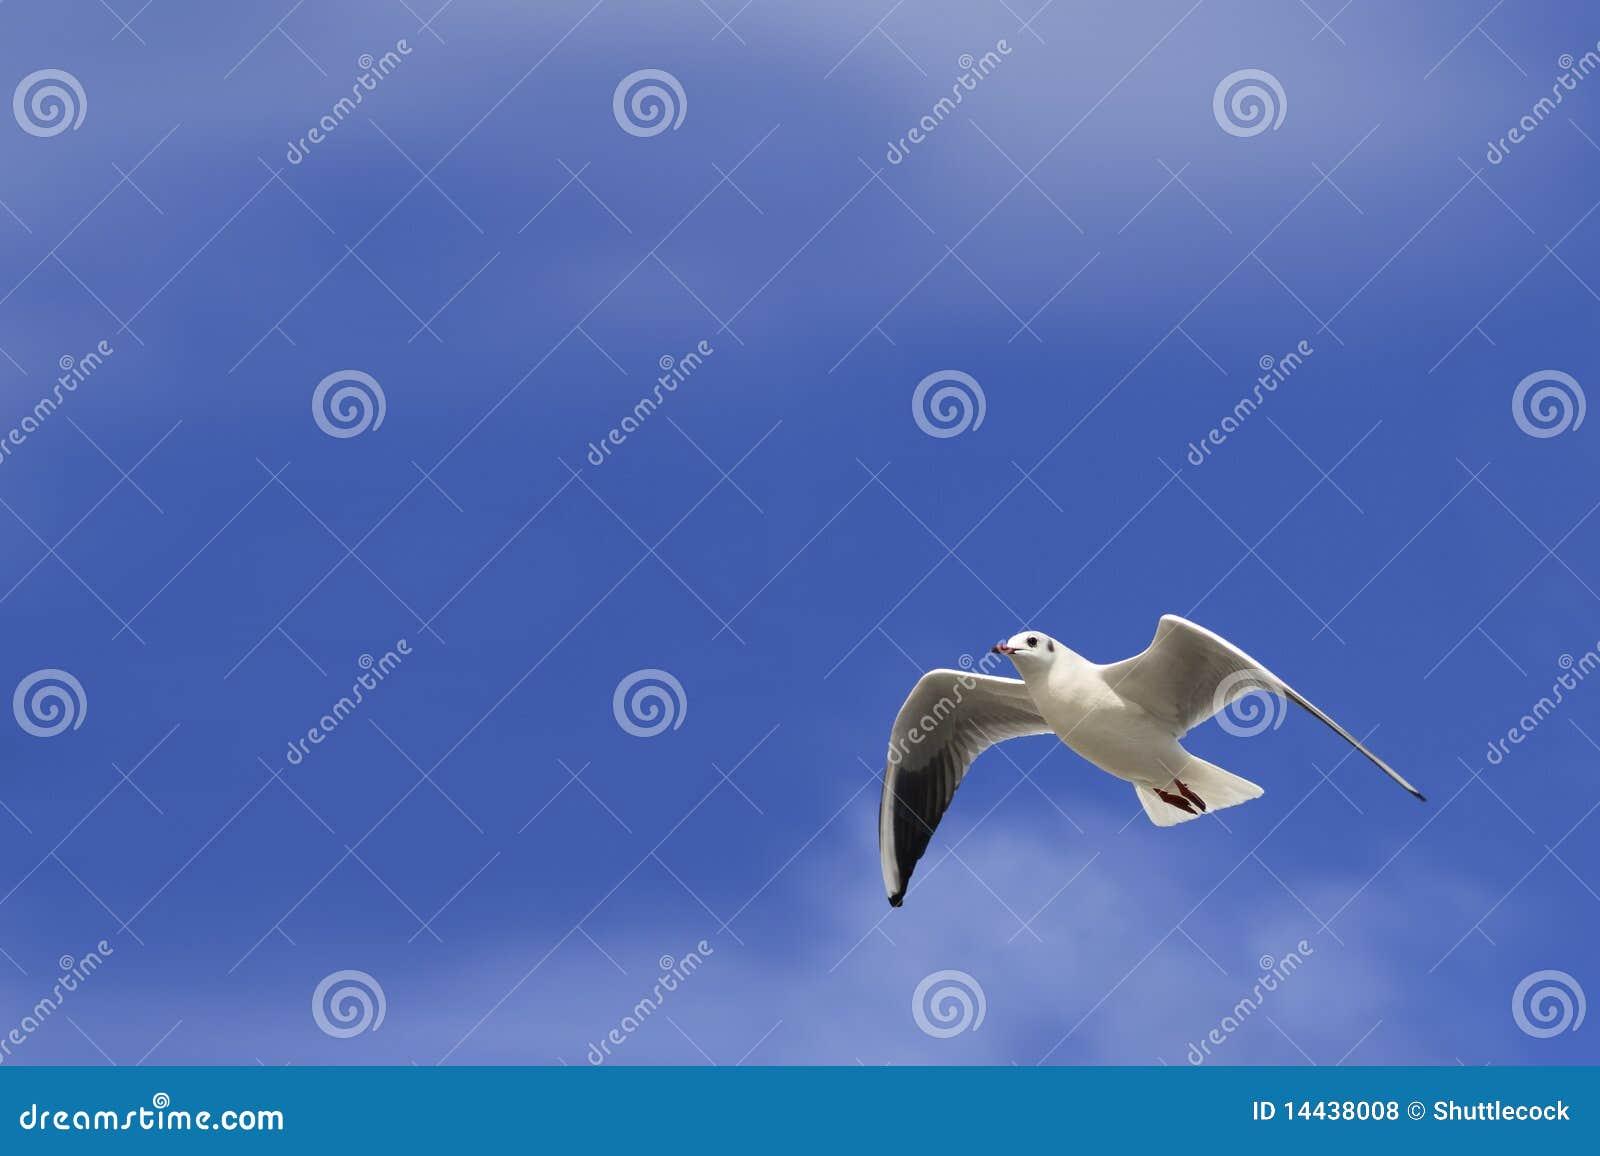 Witte duif blauwe hemel